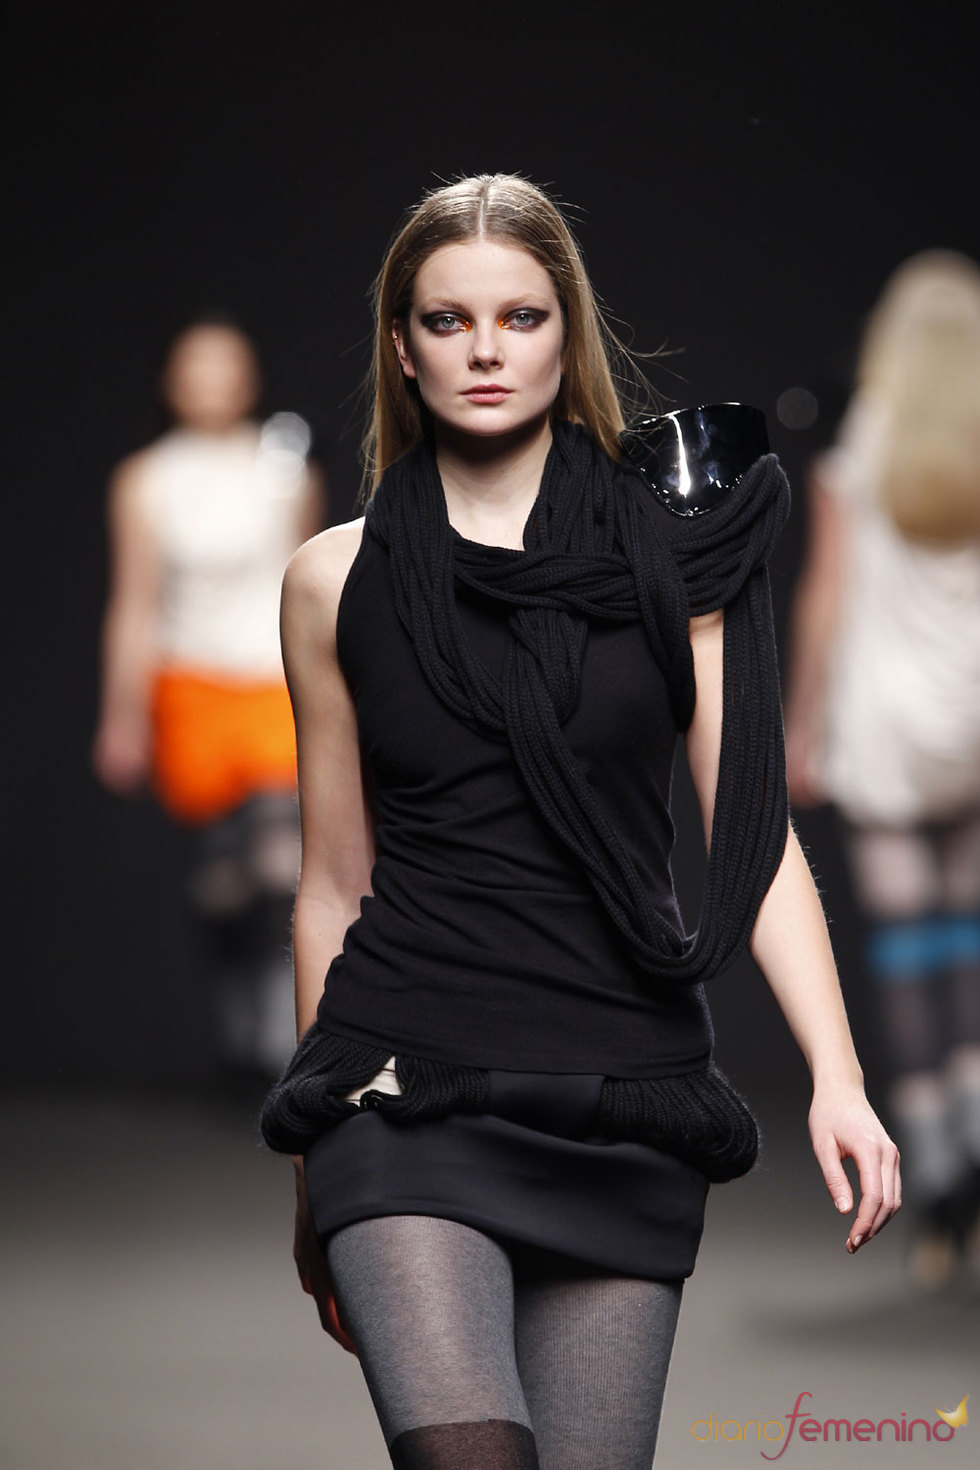 Amaya Arzuaga - Moda Femenina Otoño Invierno 2010 - 2011